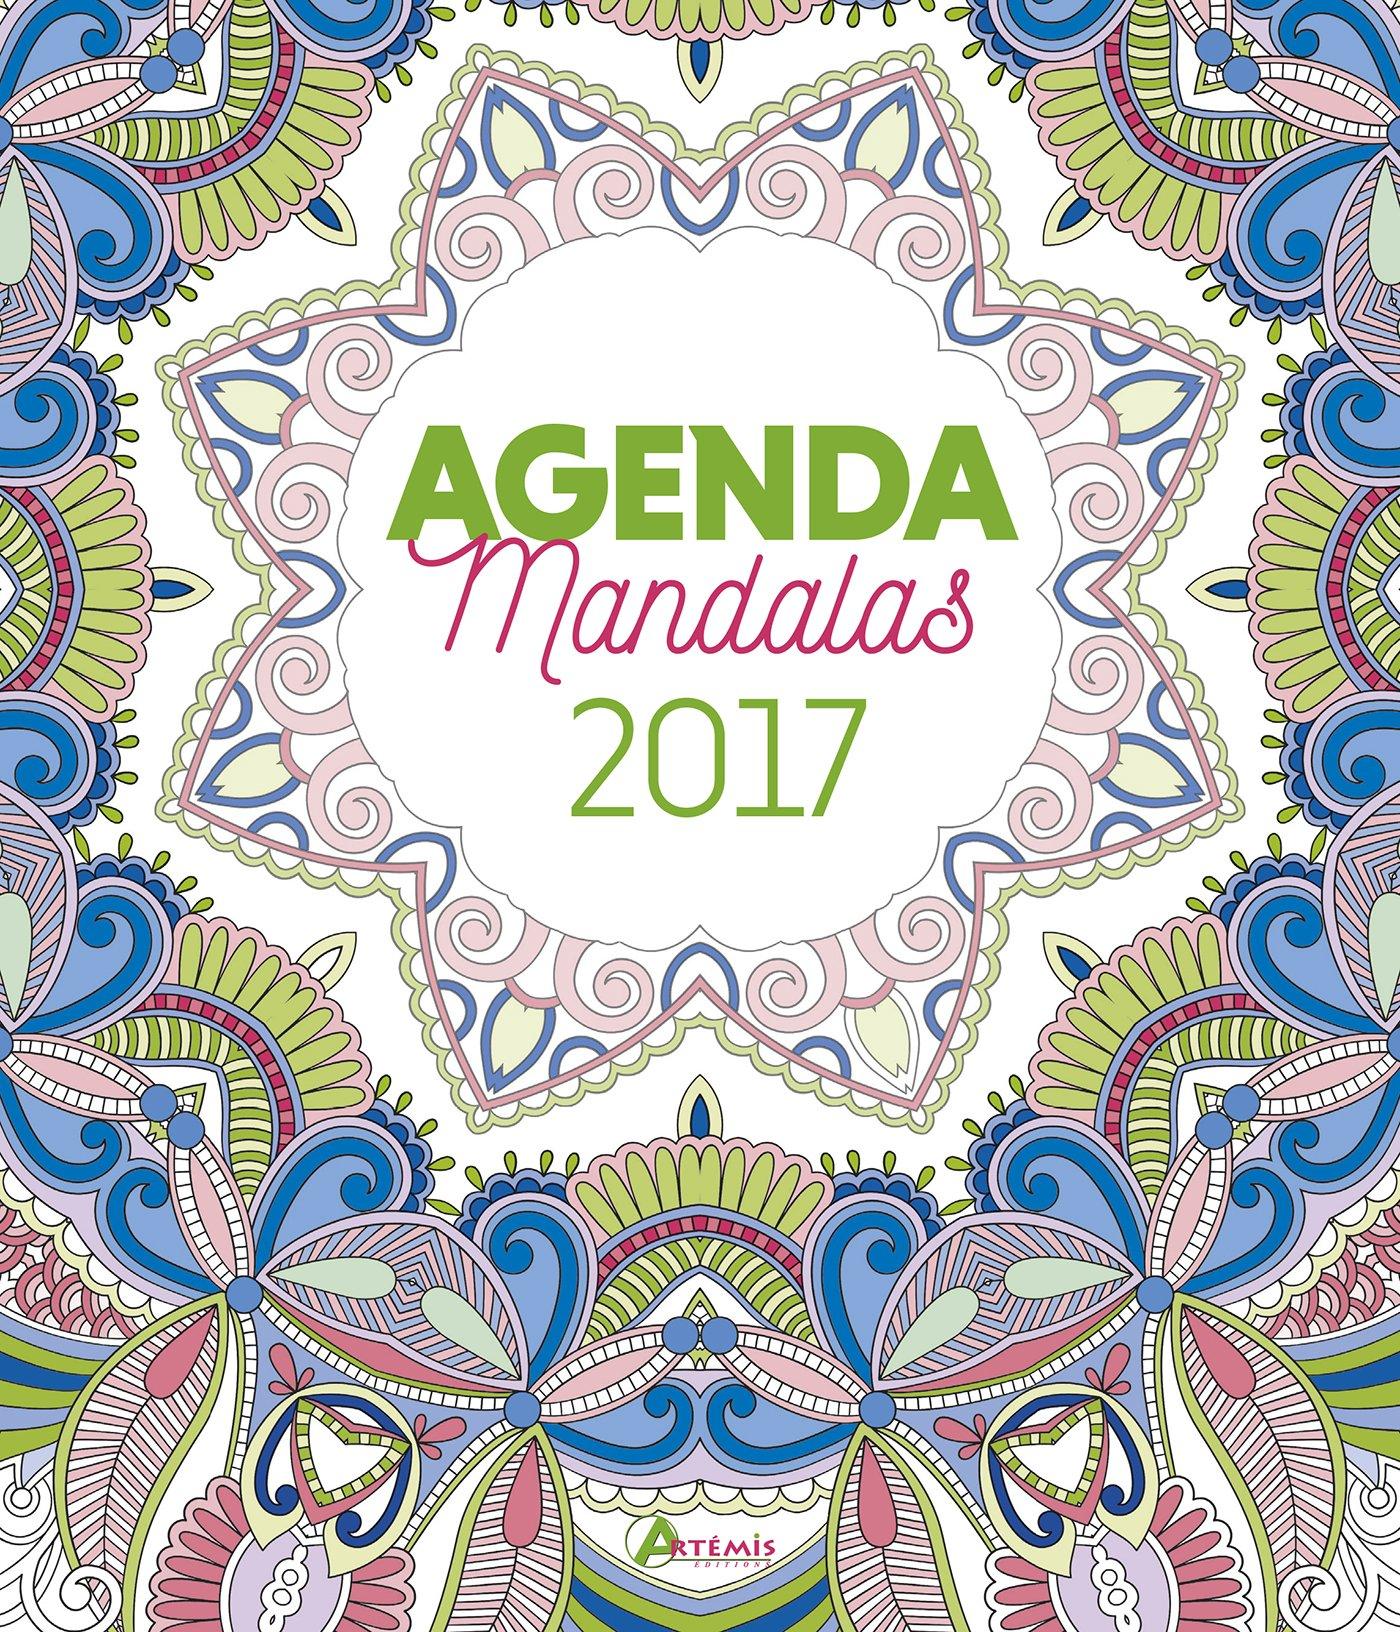 Agenda mandalas 2017: Amazon.es: Losange, Carles Baro ...